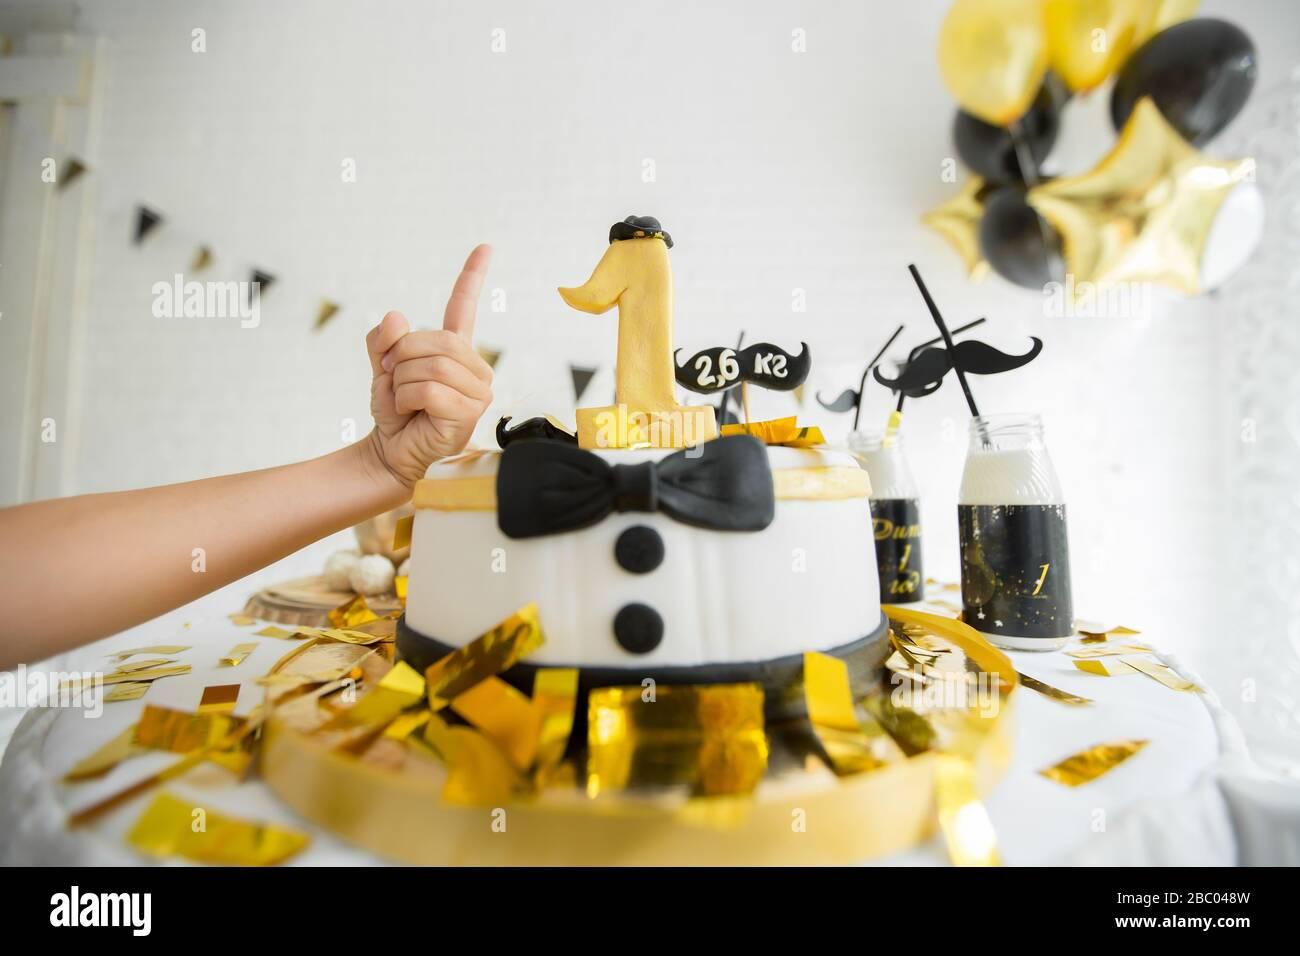 Awe Inspiring Cake For First Birthday Number One Made Of Sugar Cake Decorated Birthday Cards Printable Benkemecafe Filternl